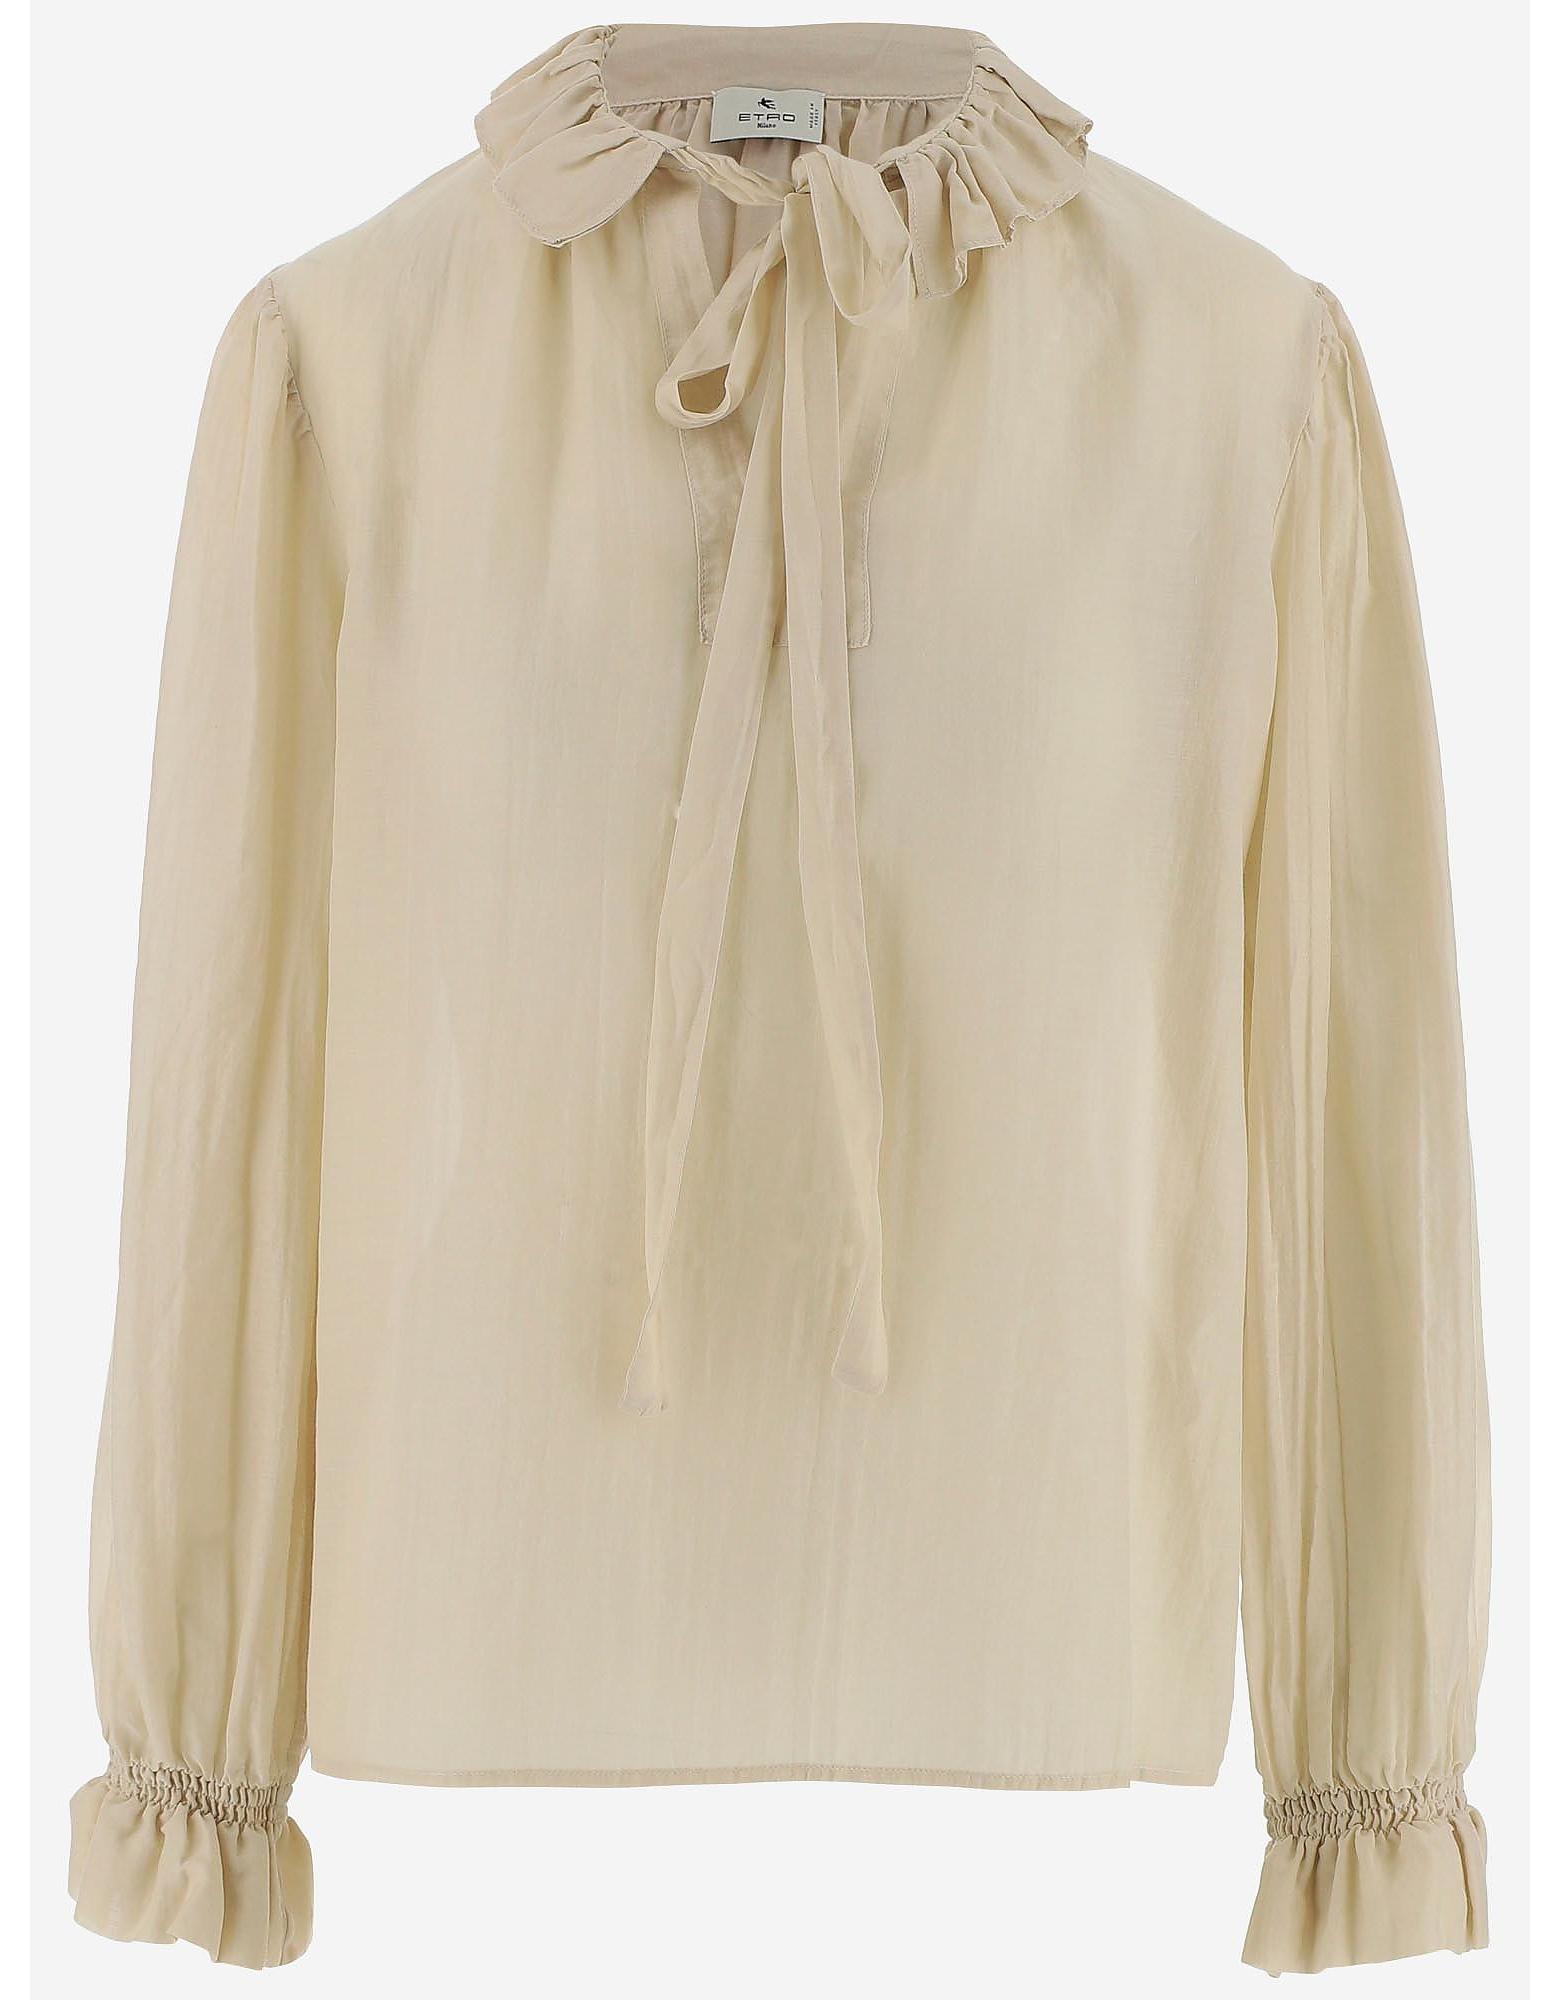 Etro Designer Shirts, Natural Cotton and Silk Blend Women's Shirt